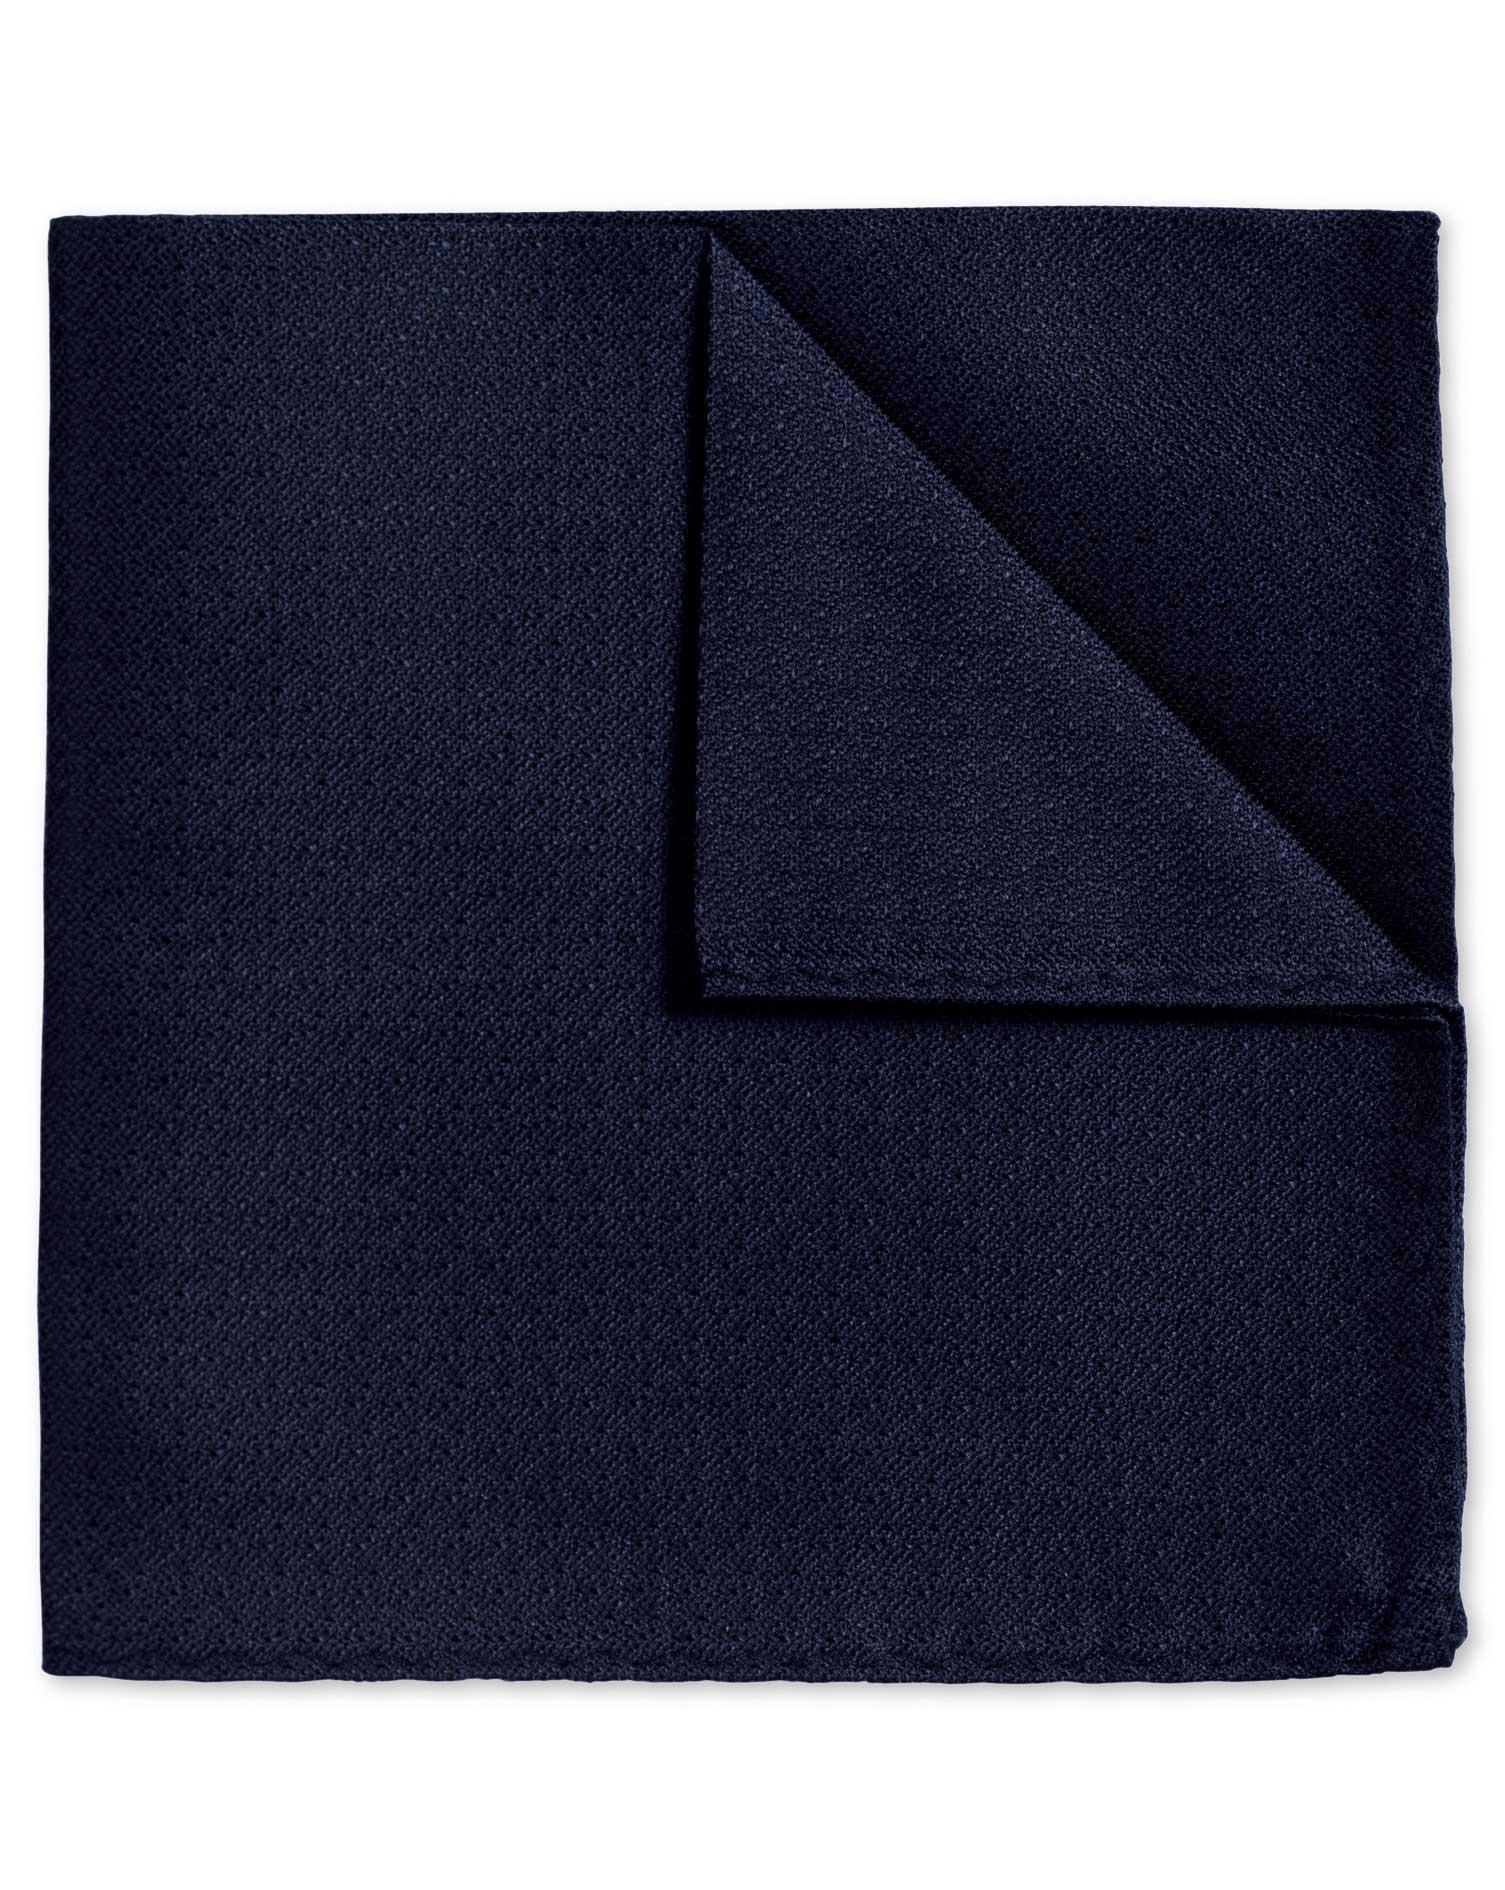 Navy Textured Plain Classic Silk Pocket Square Size OSFA by Charles Tyrwhitt